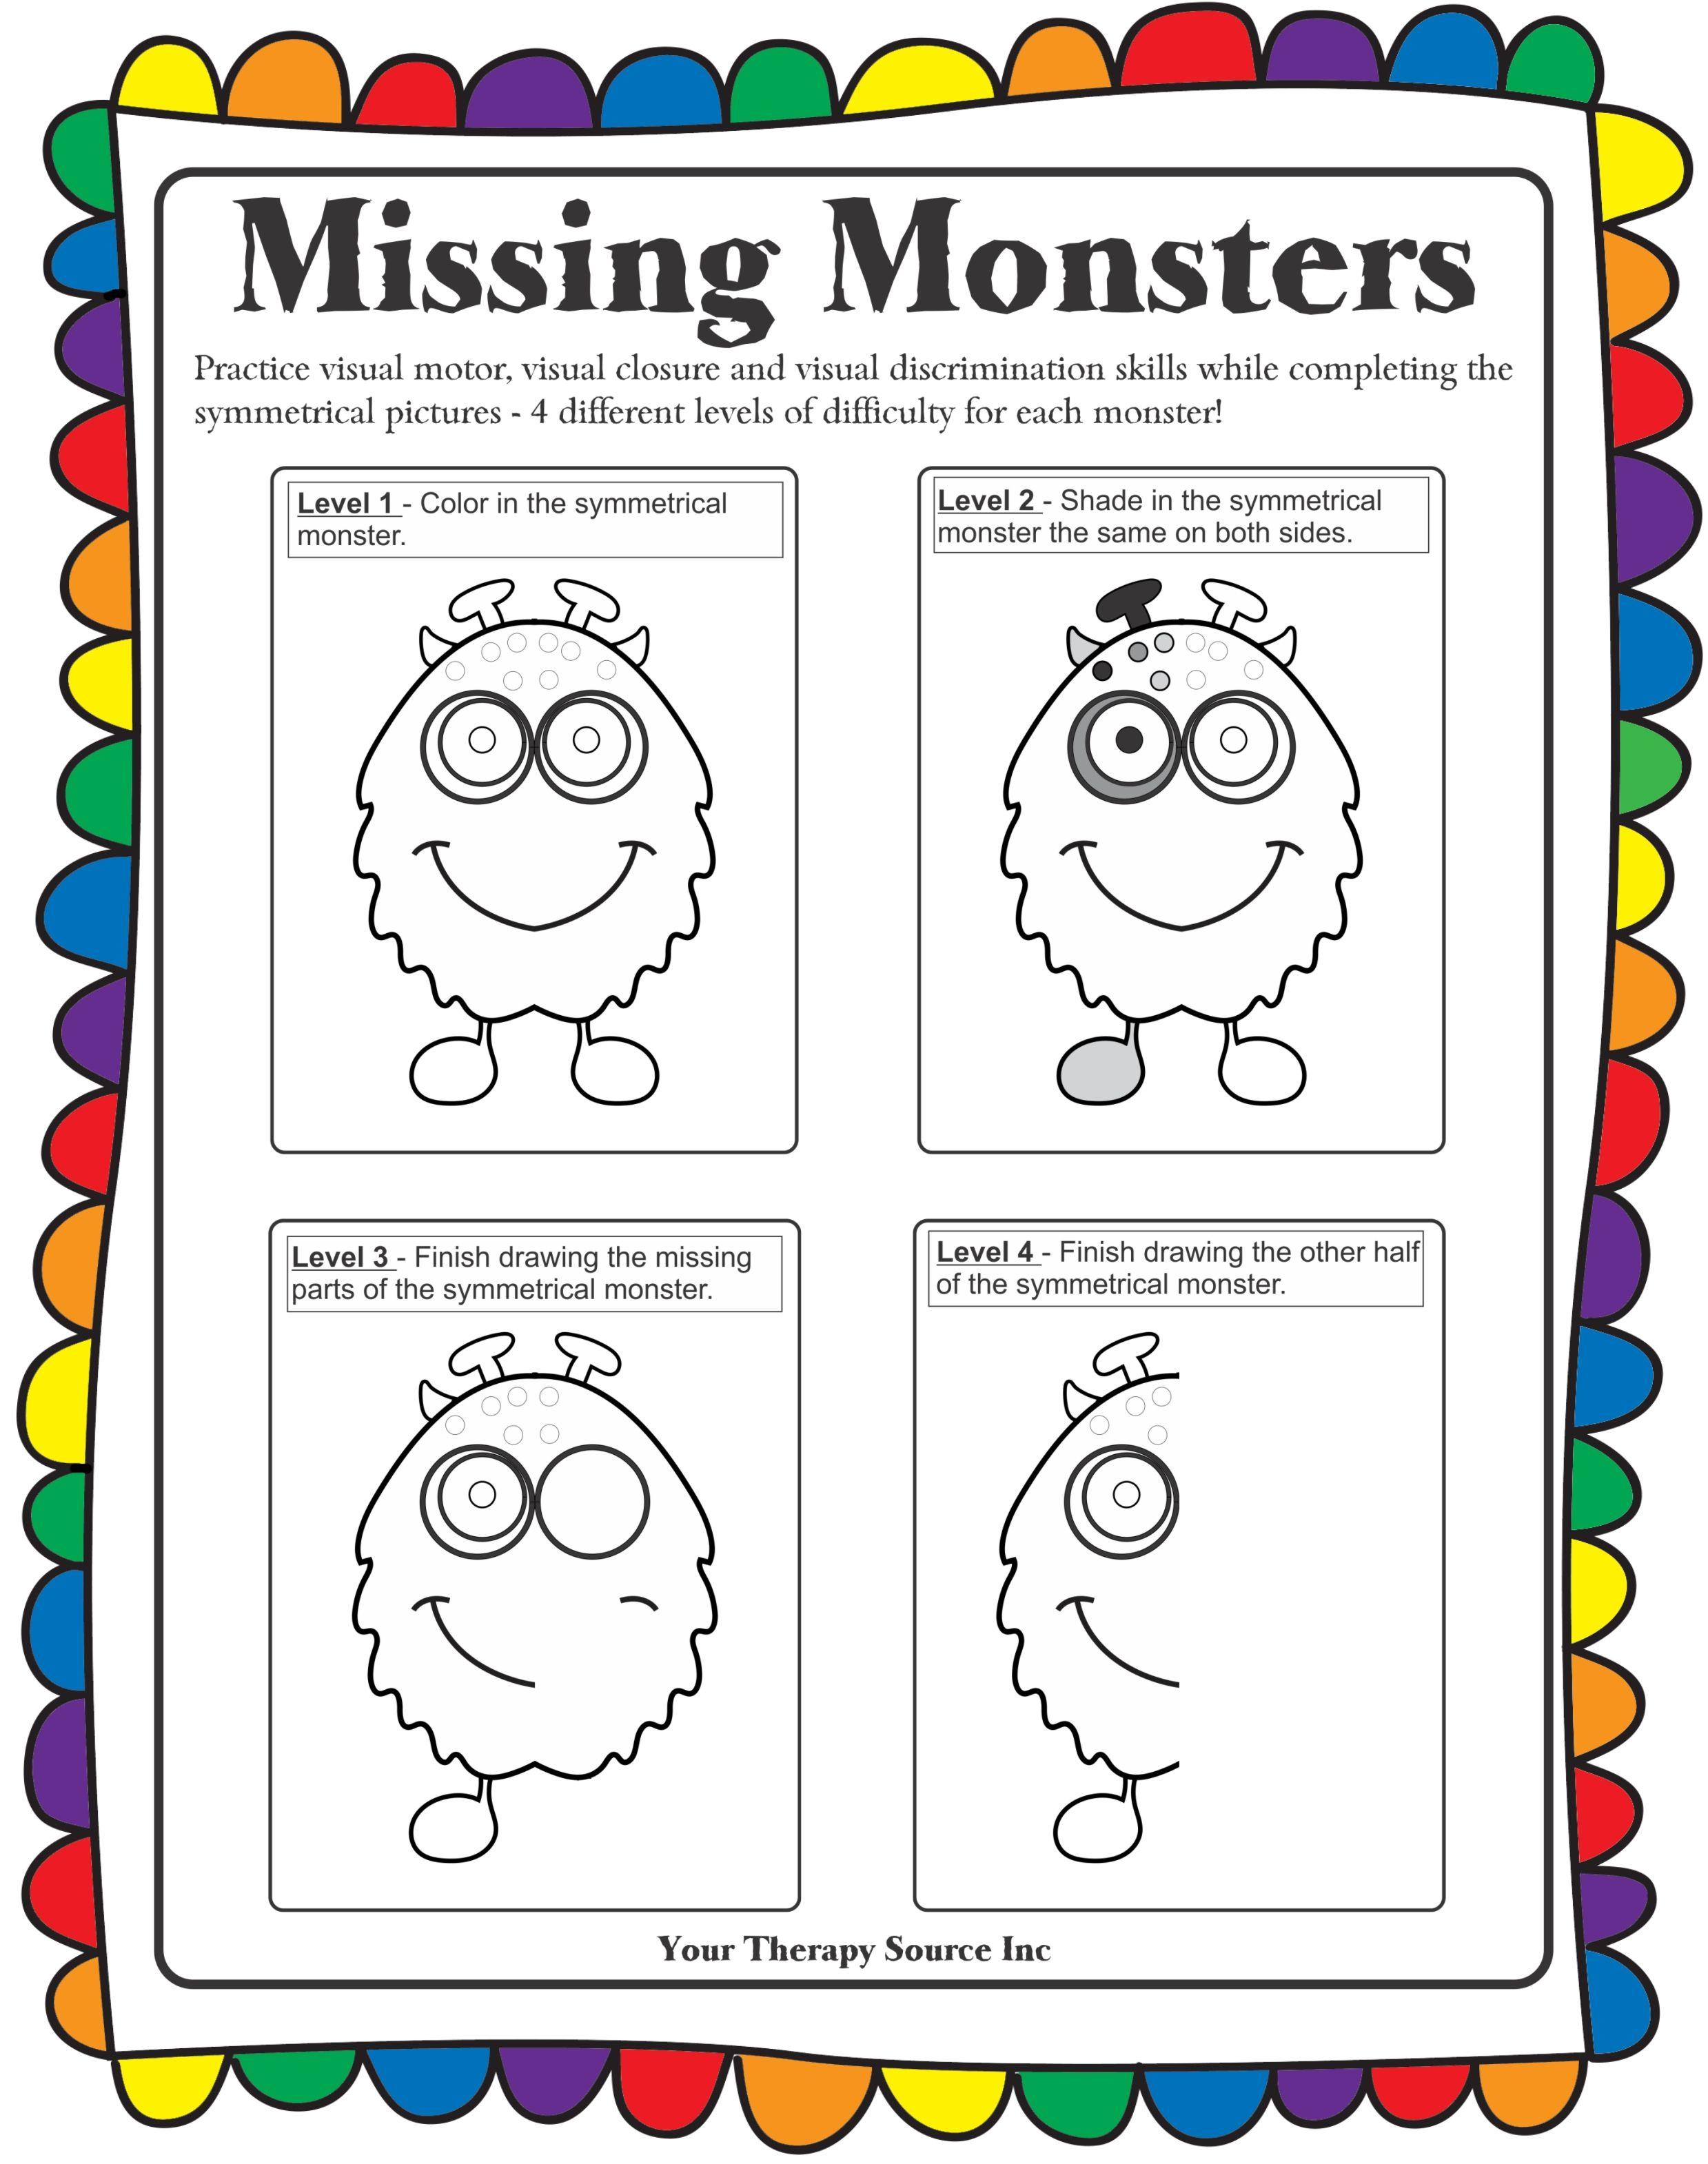 Missing Monsters